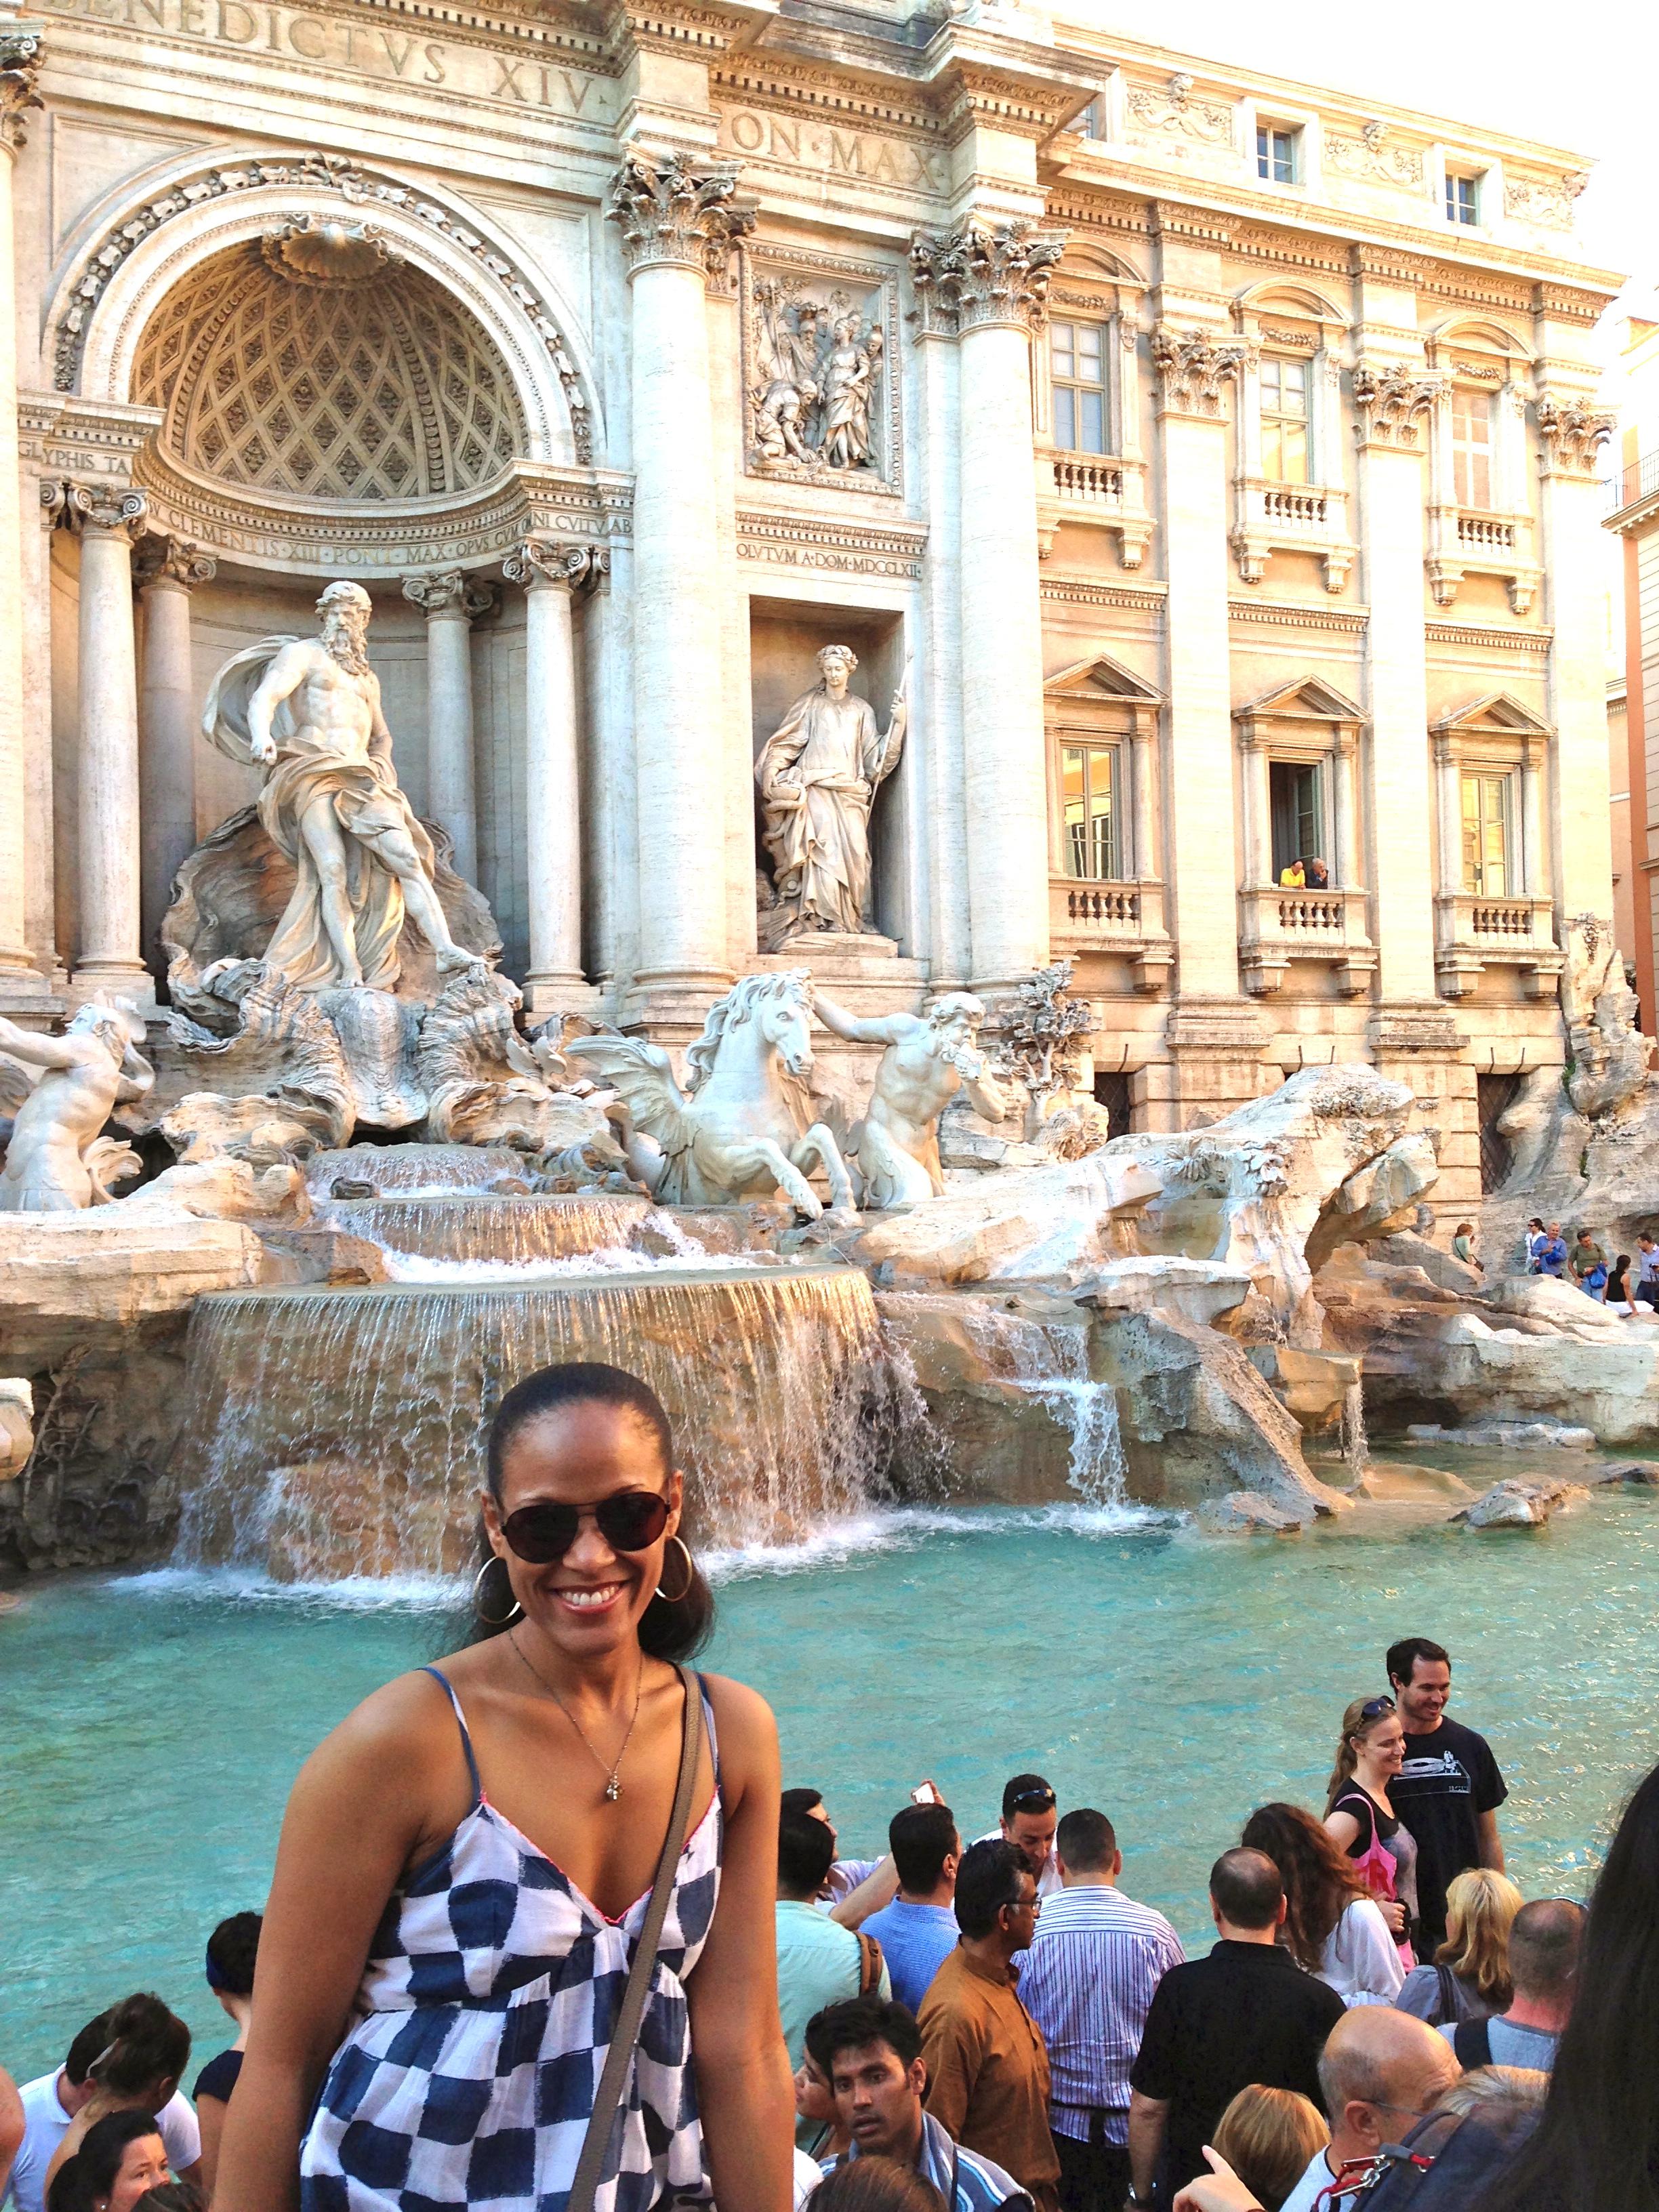 The Fontana di Trevi